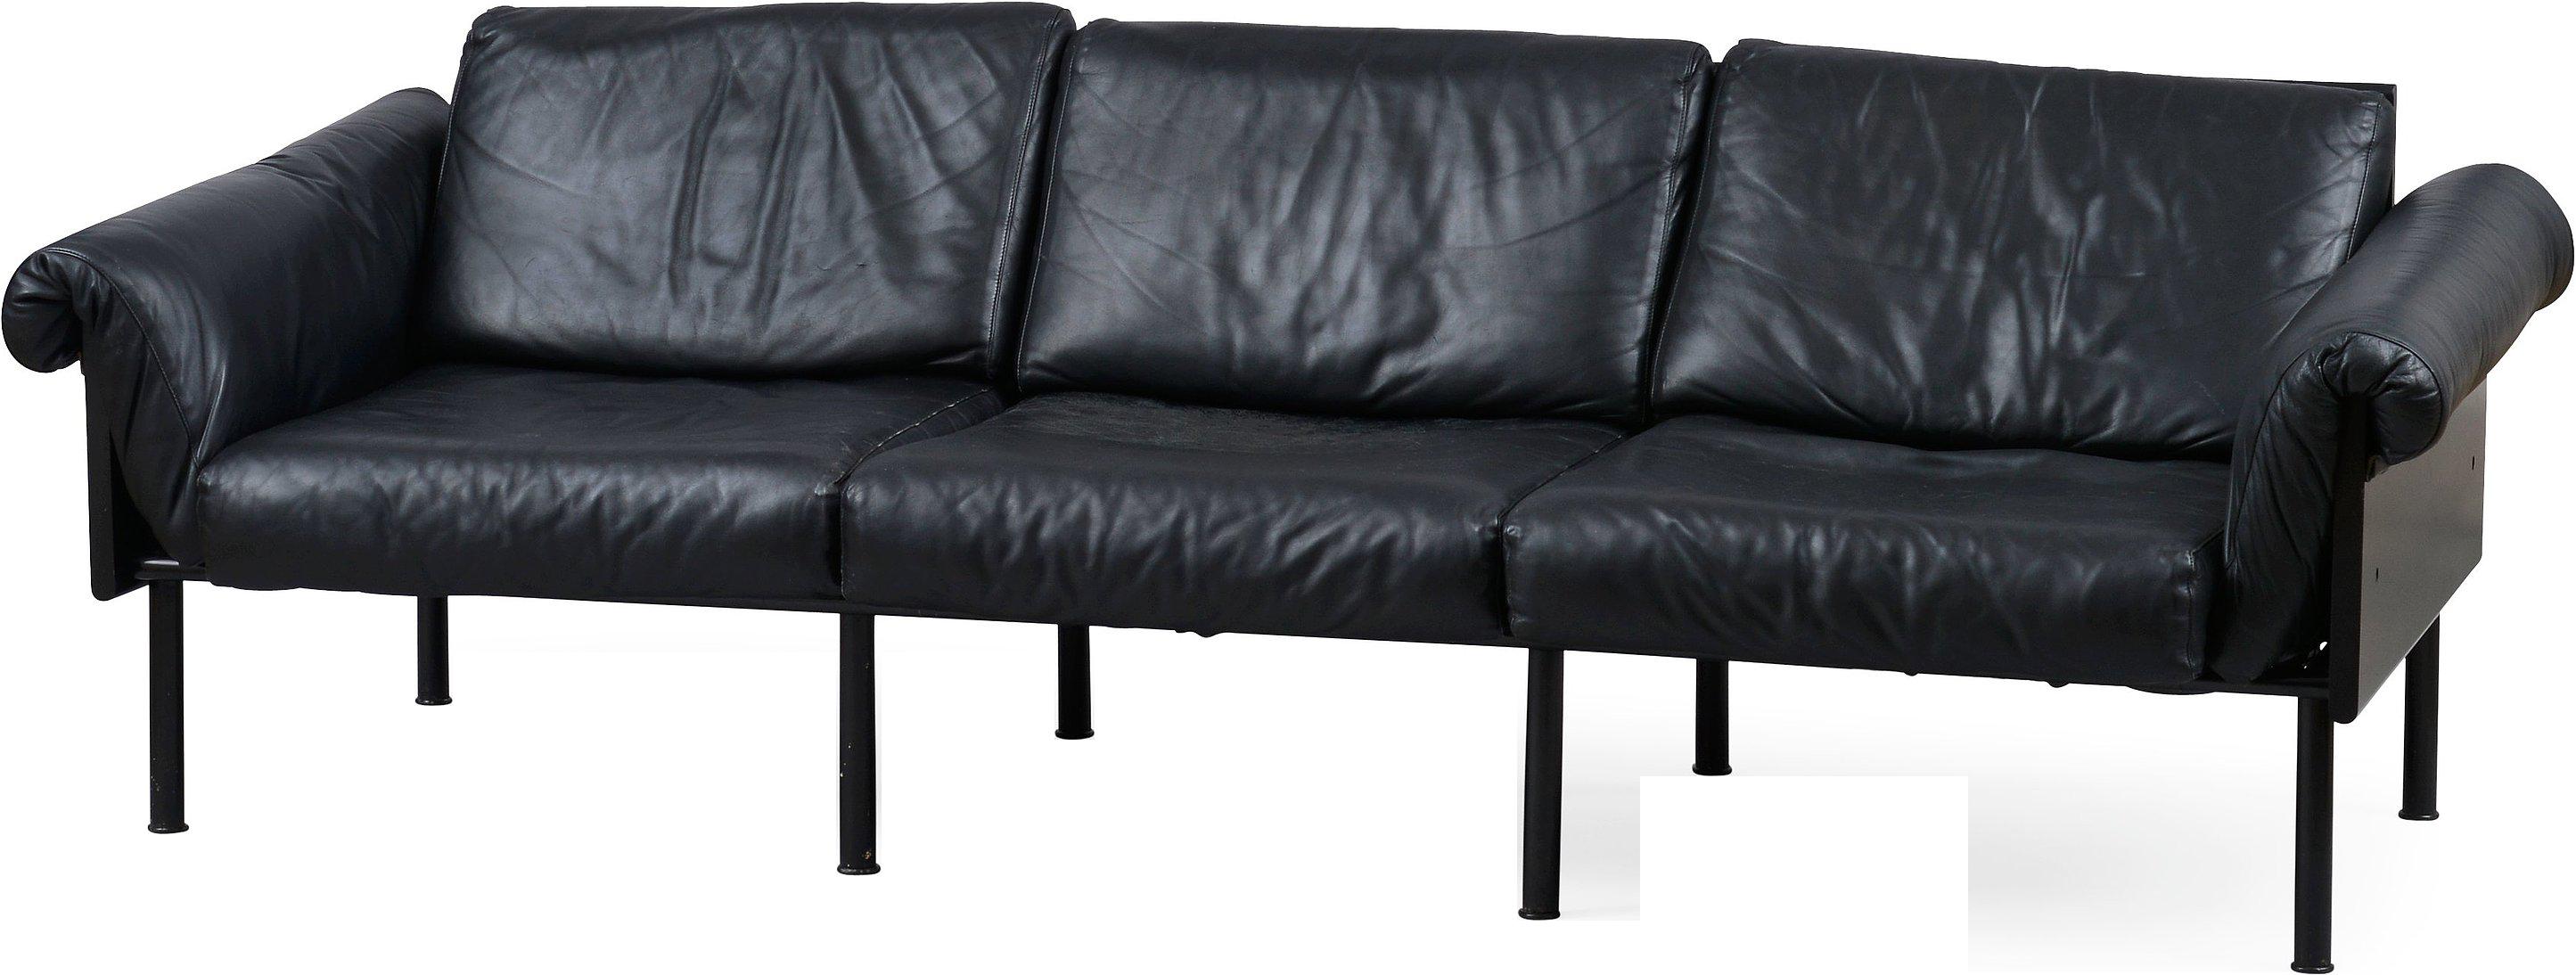 Sofa Png Image Sofa Love Seat Bedstead